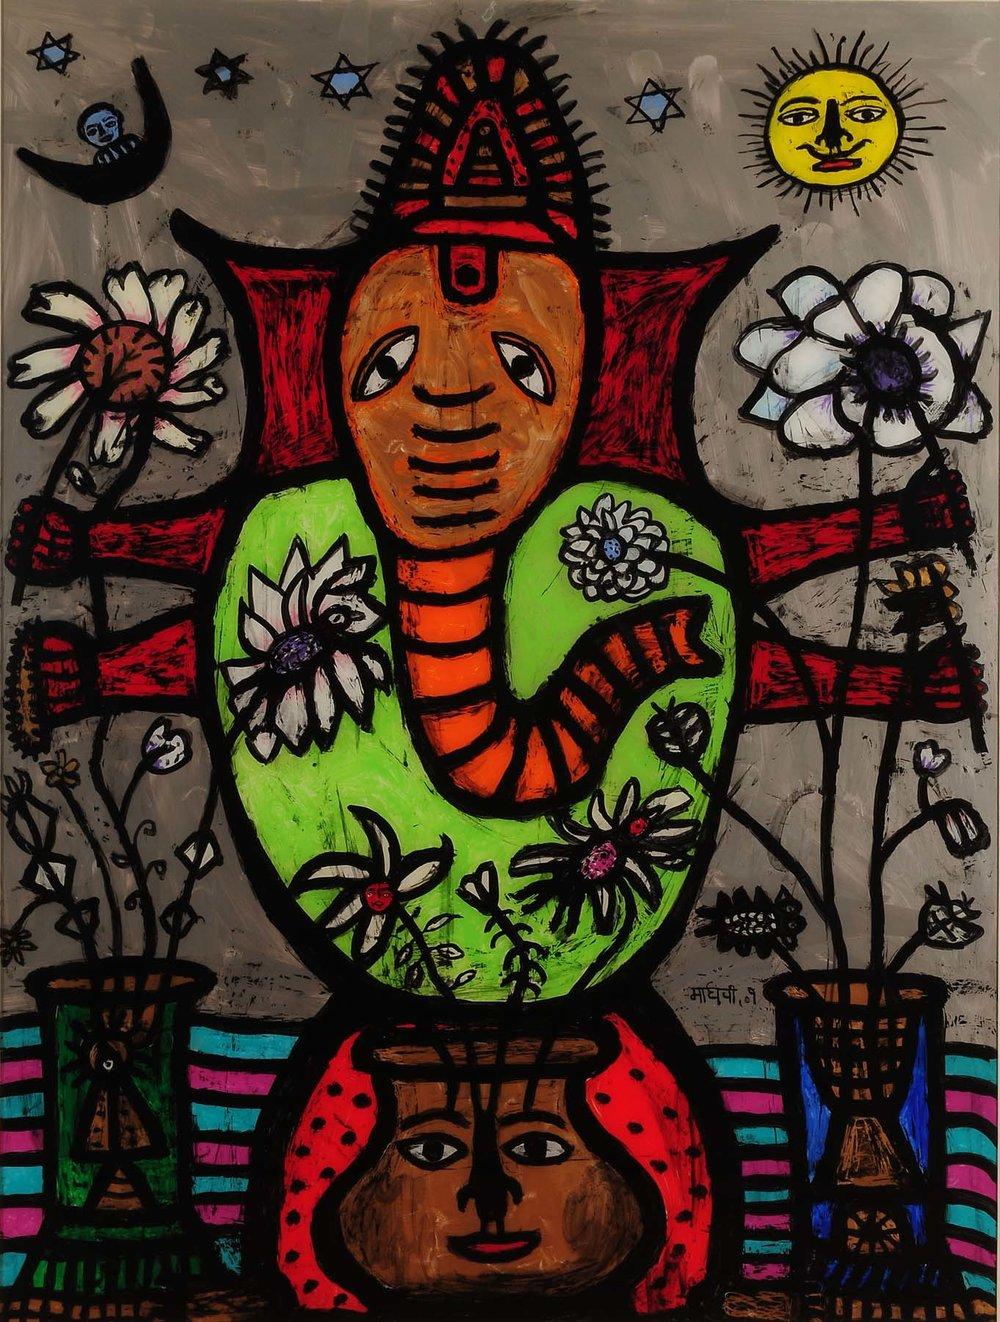 God of Prosperity and Peace. Acrylic on acrylic sheet (reverse painting), 48 x 36 inches. Art No. 7619.